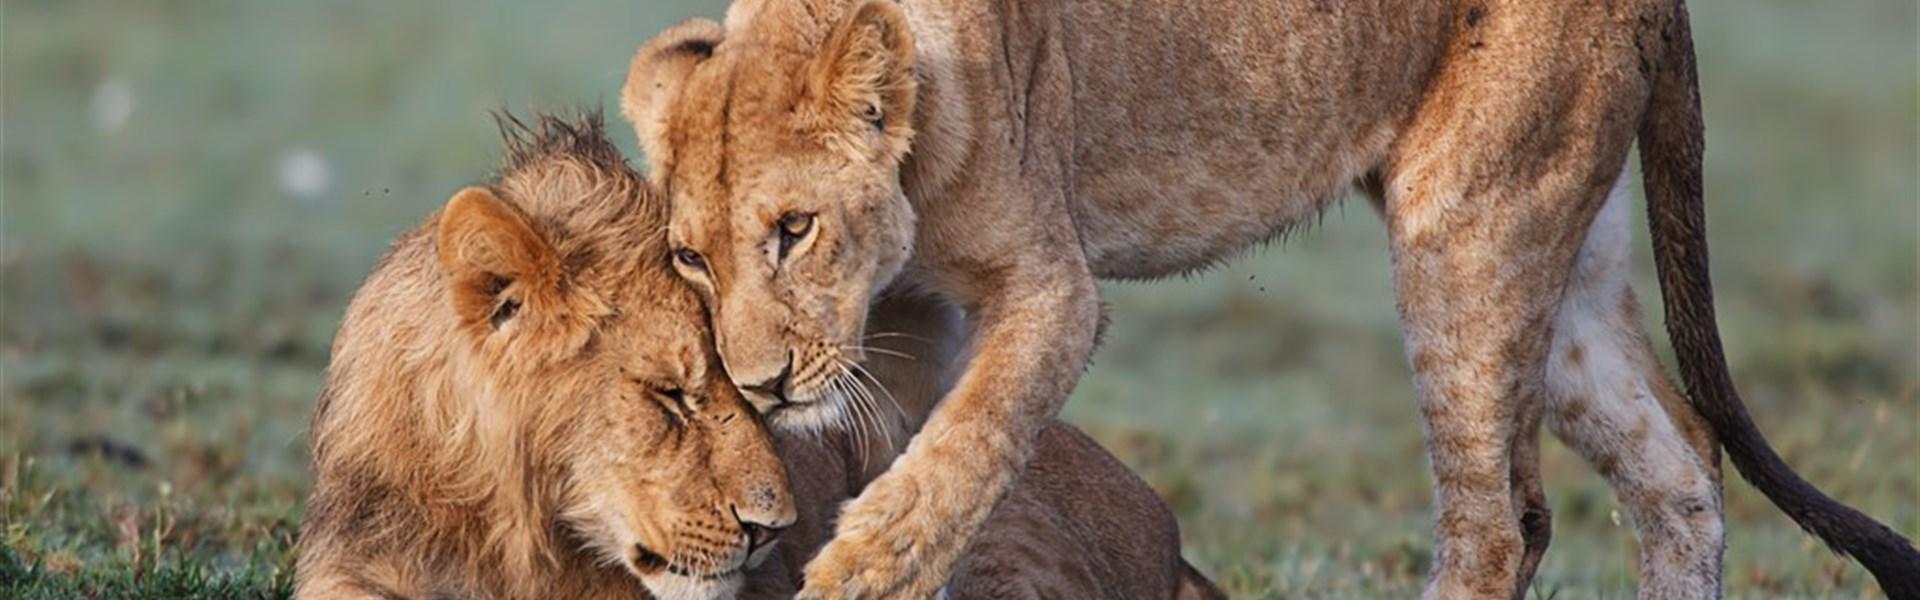 Safari v Keni s prodloužením u moře -